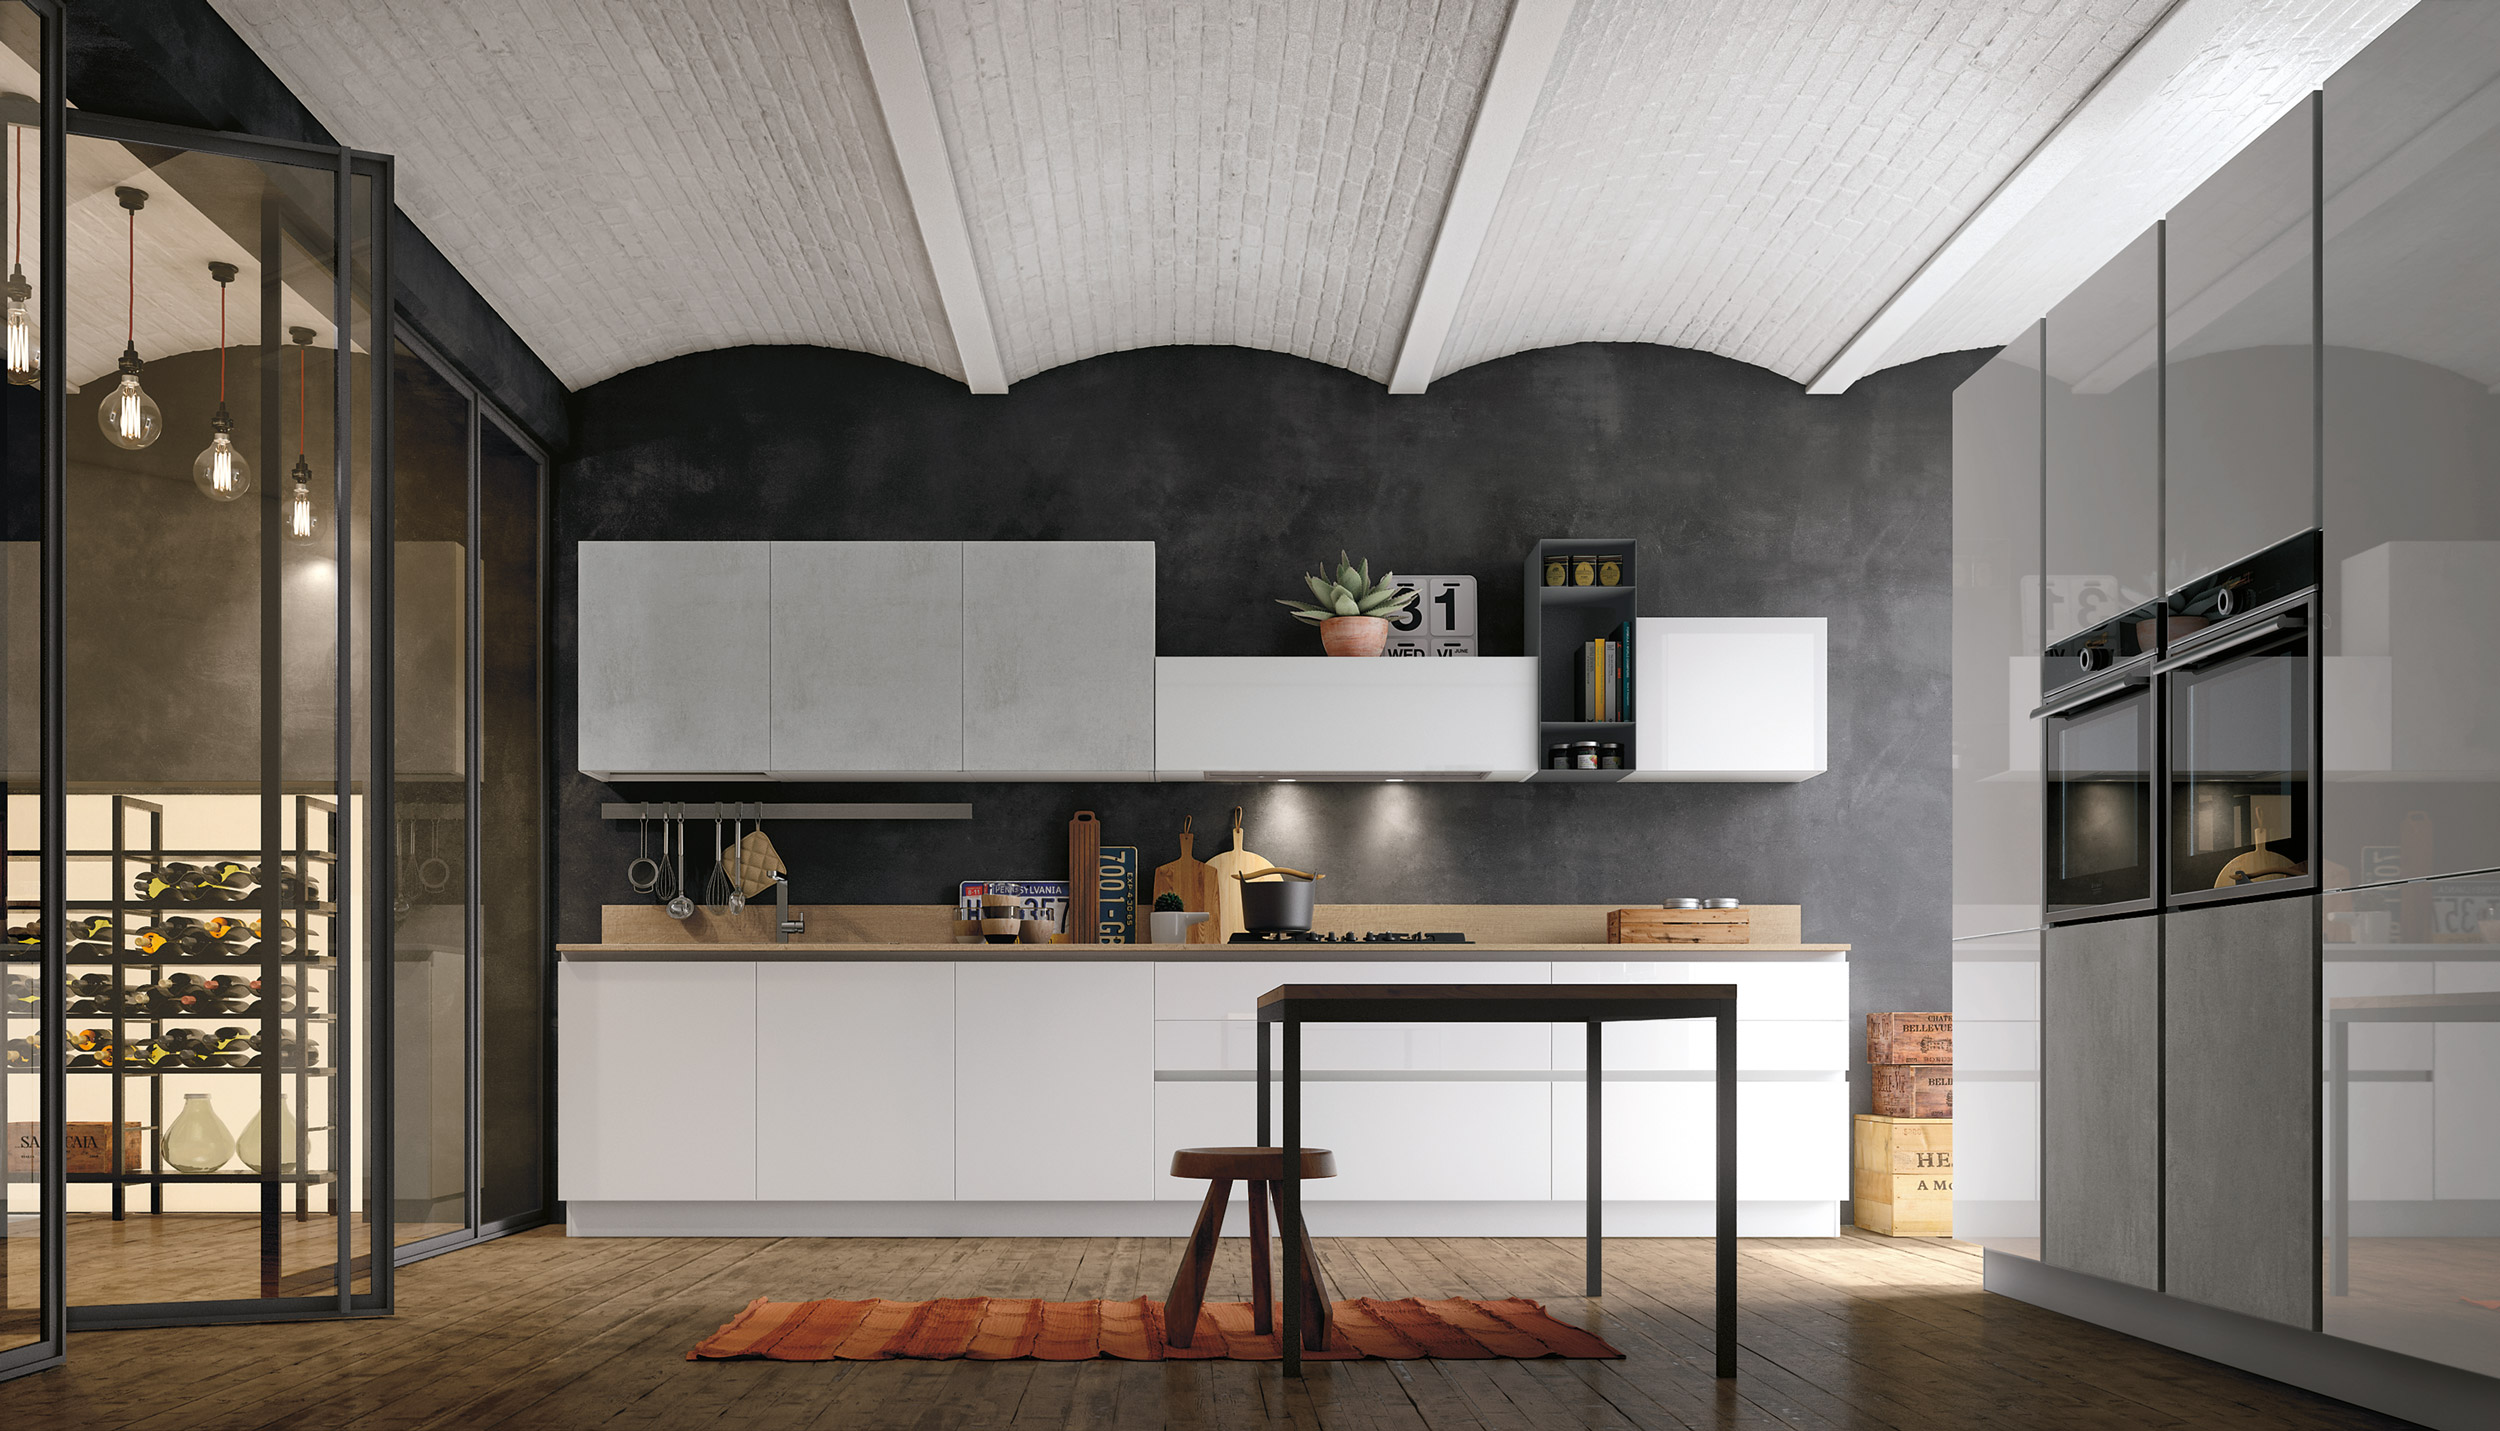 Cucina stosa aliant lorenzelli arredamenti - Cucine in vetro ...